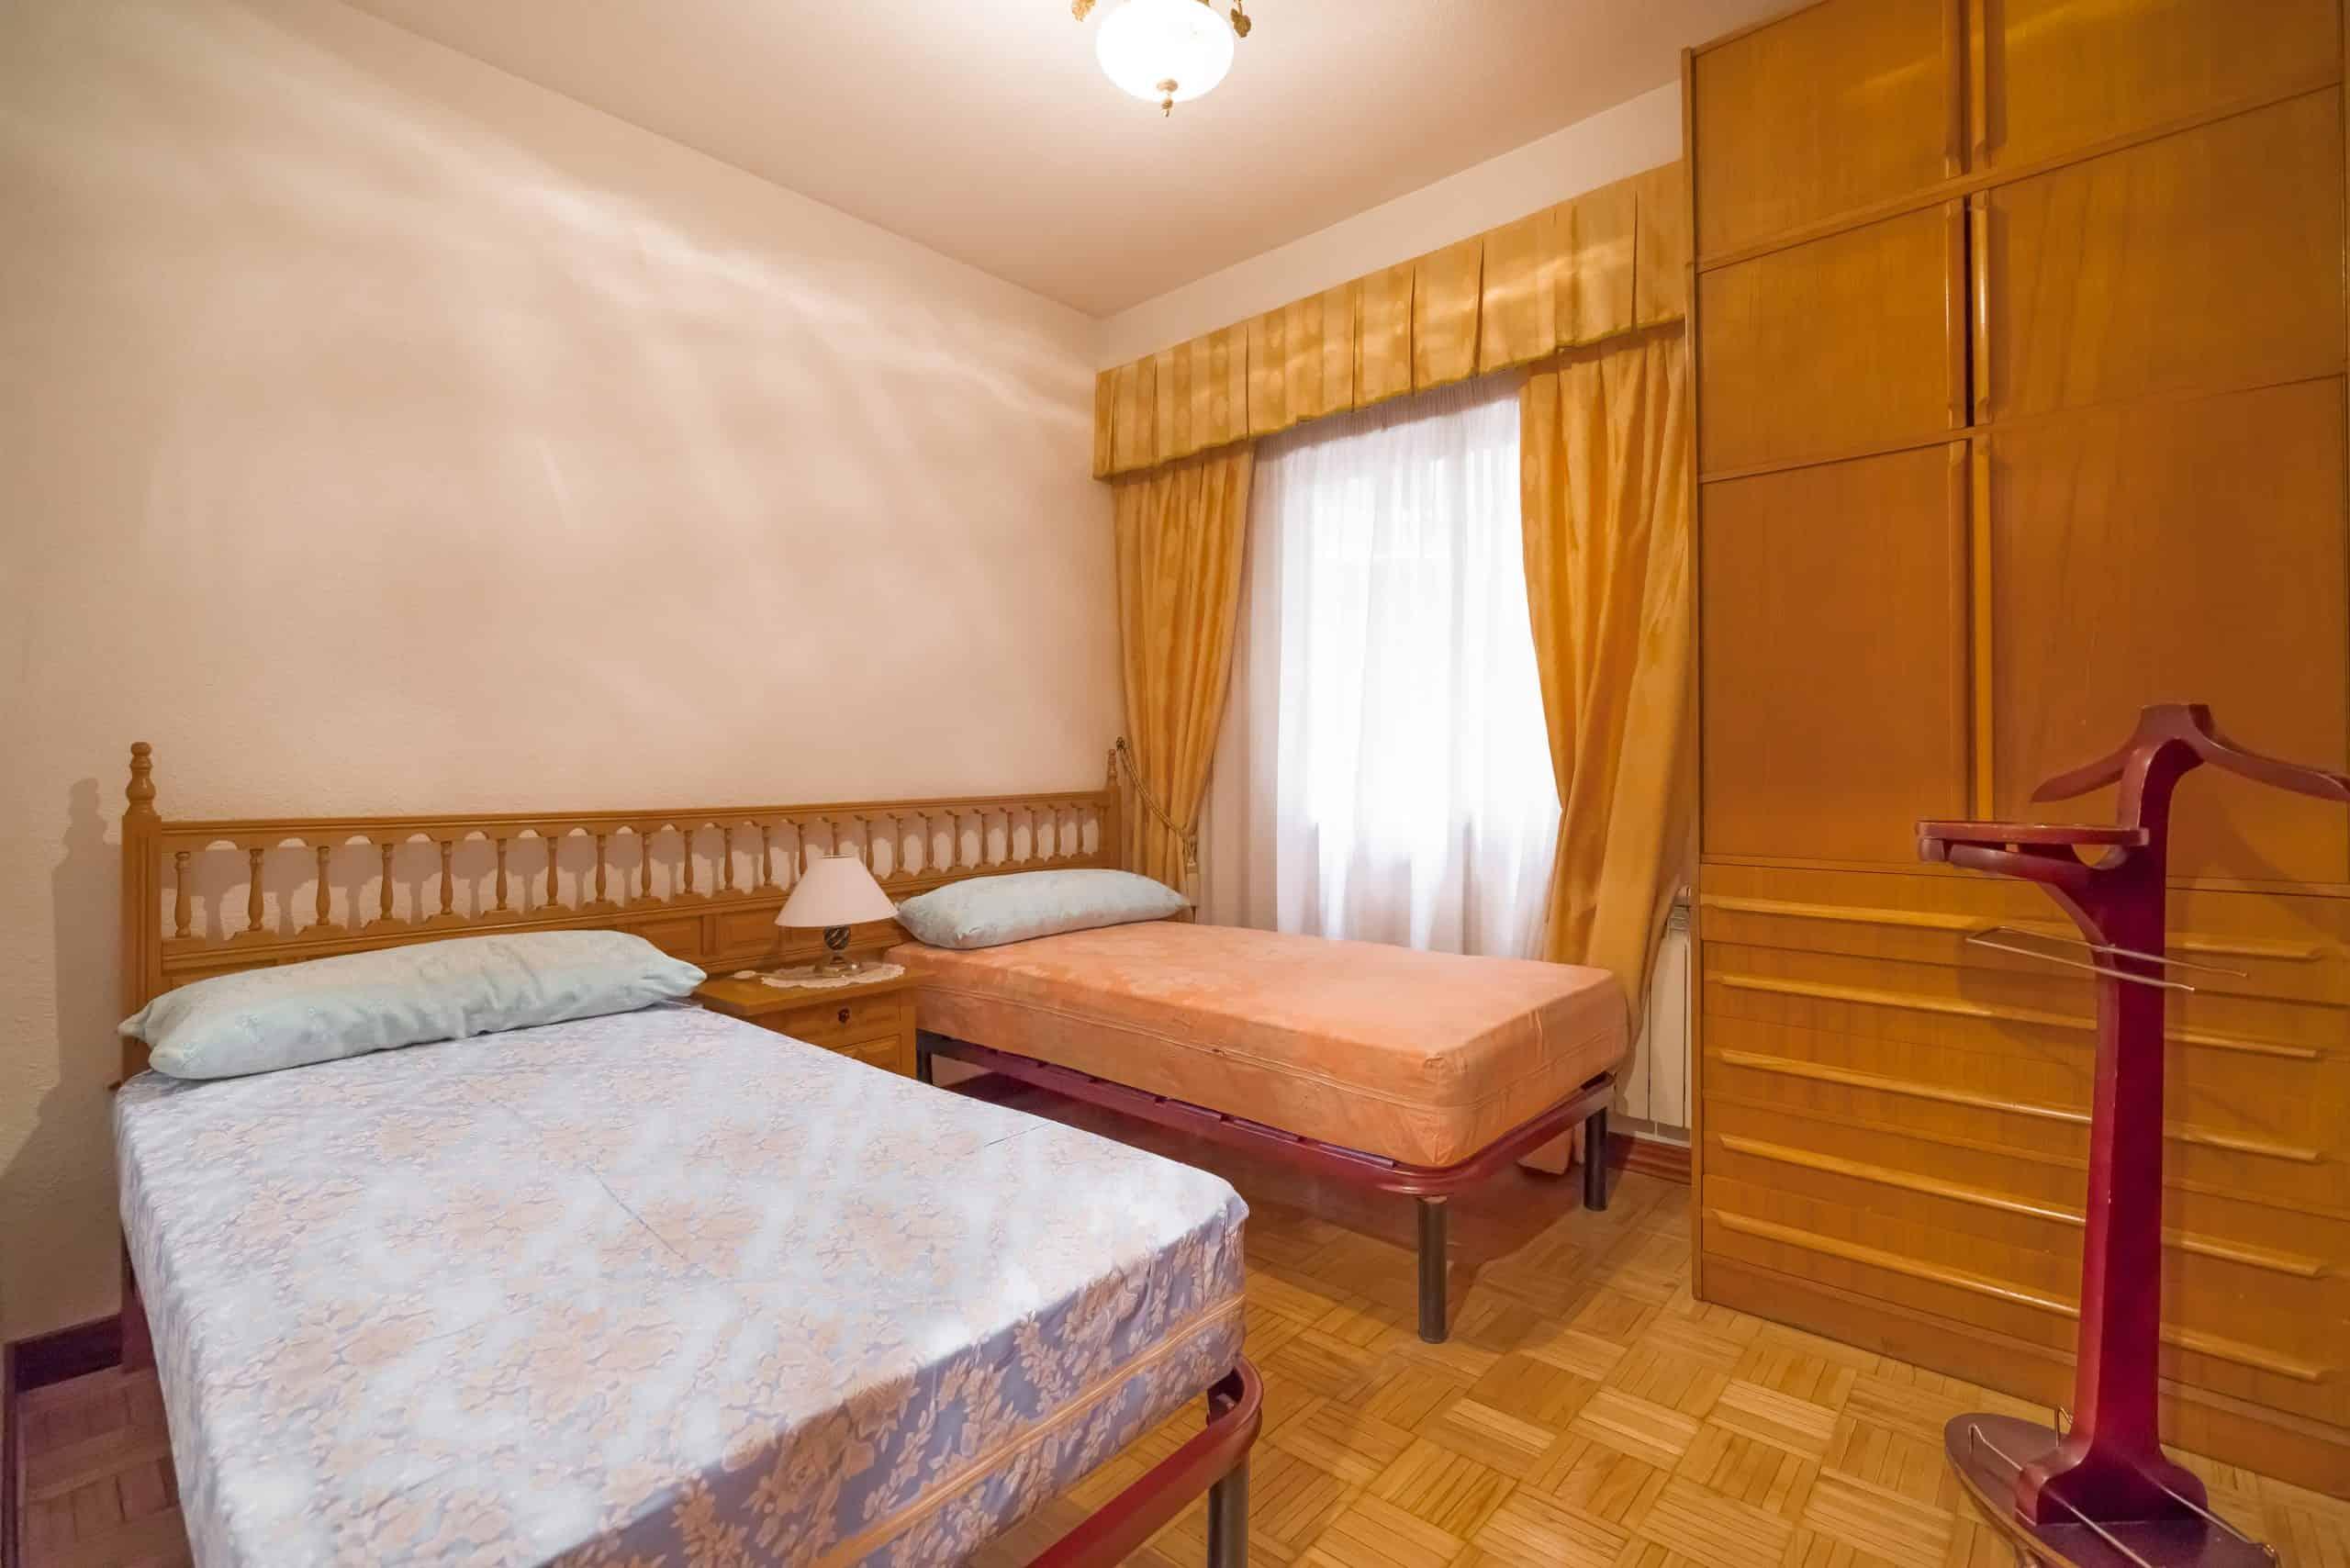 Agencia Inmobiliaria de Madrid-FUTUROCASA-Zona ARGANZUELA-EMBAJADORES-LEGAZPI -calle tomas borras- Dormitorio 2